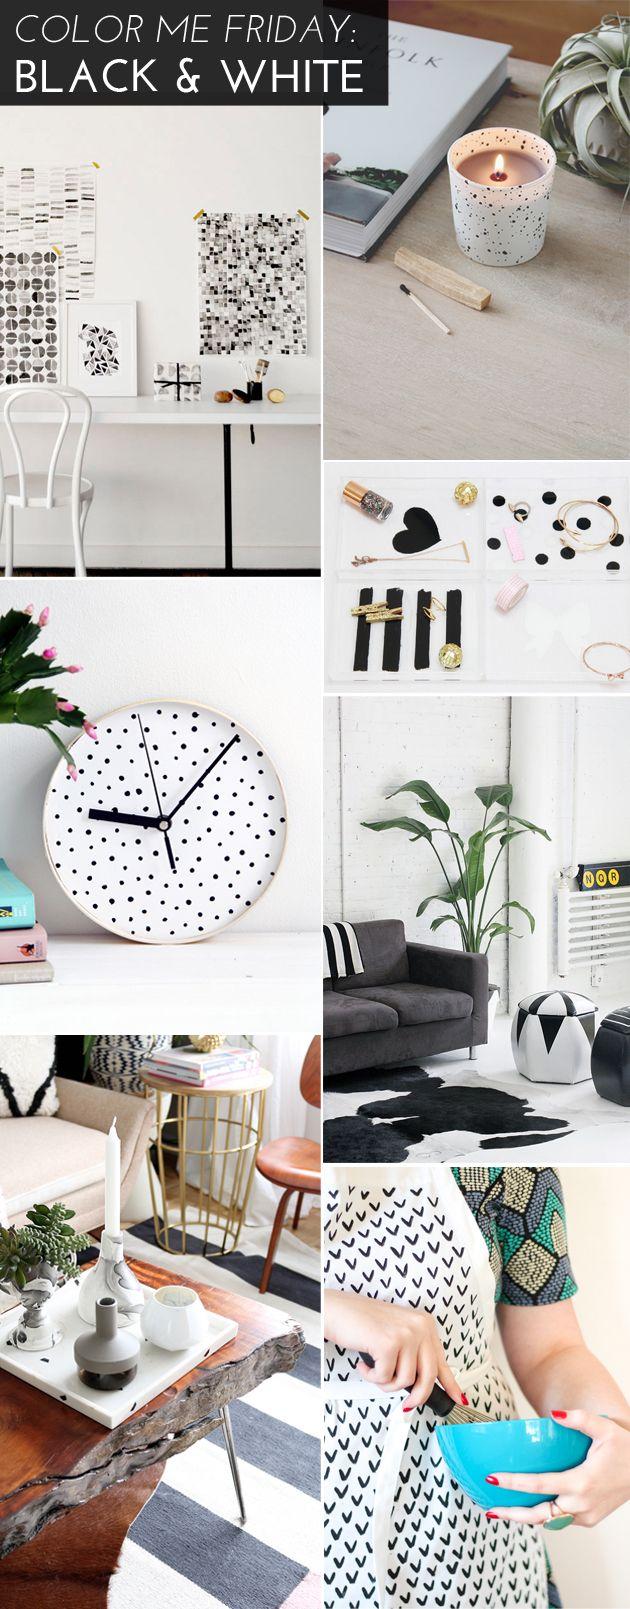 Color Me Friday: Black & White